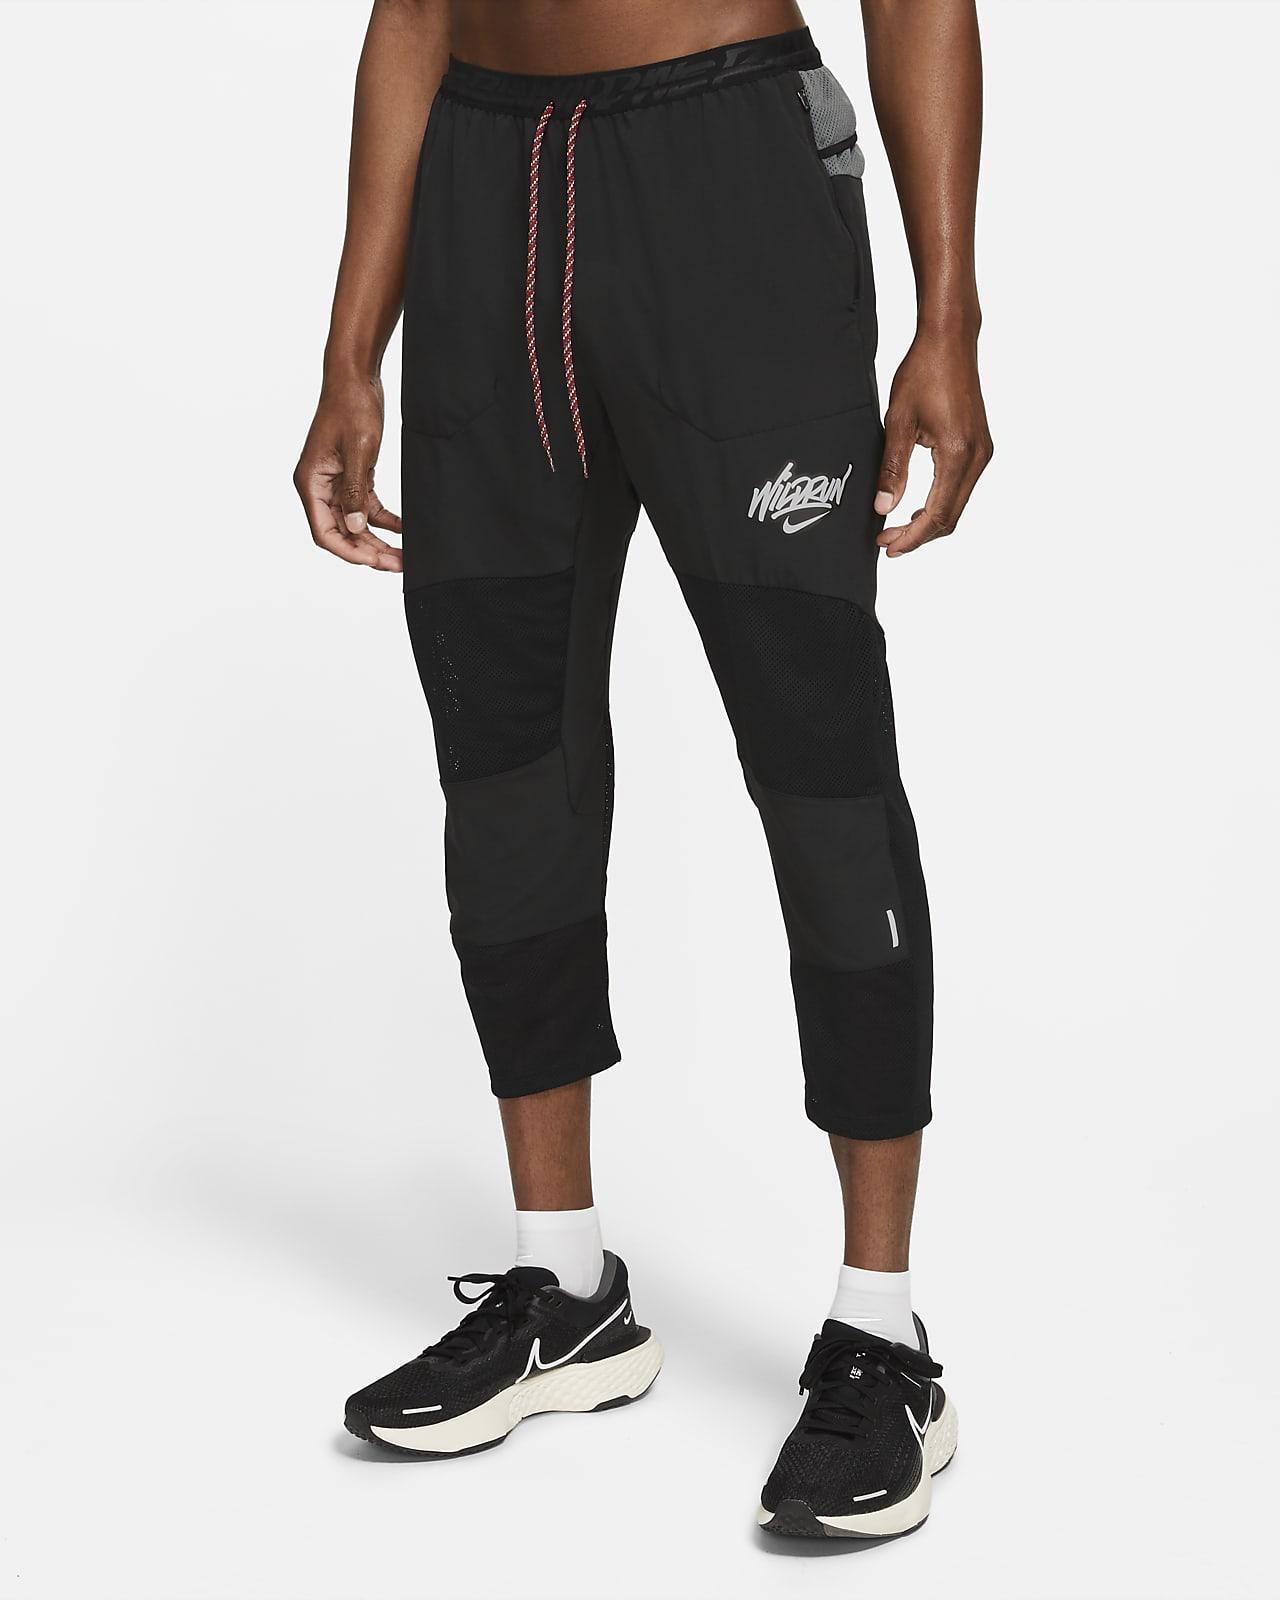 Pantalones de running de tejido Woven 7/8 para hombre Nike Phenom Elite Wild Run